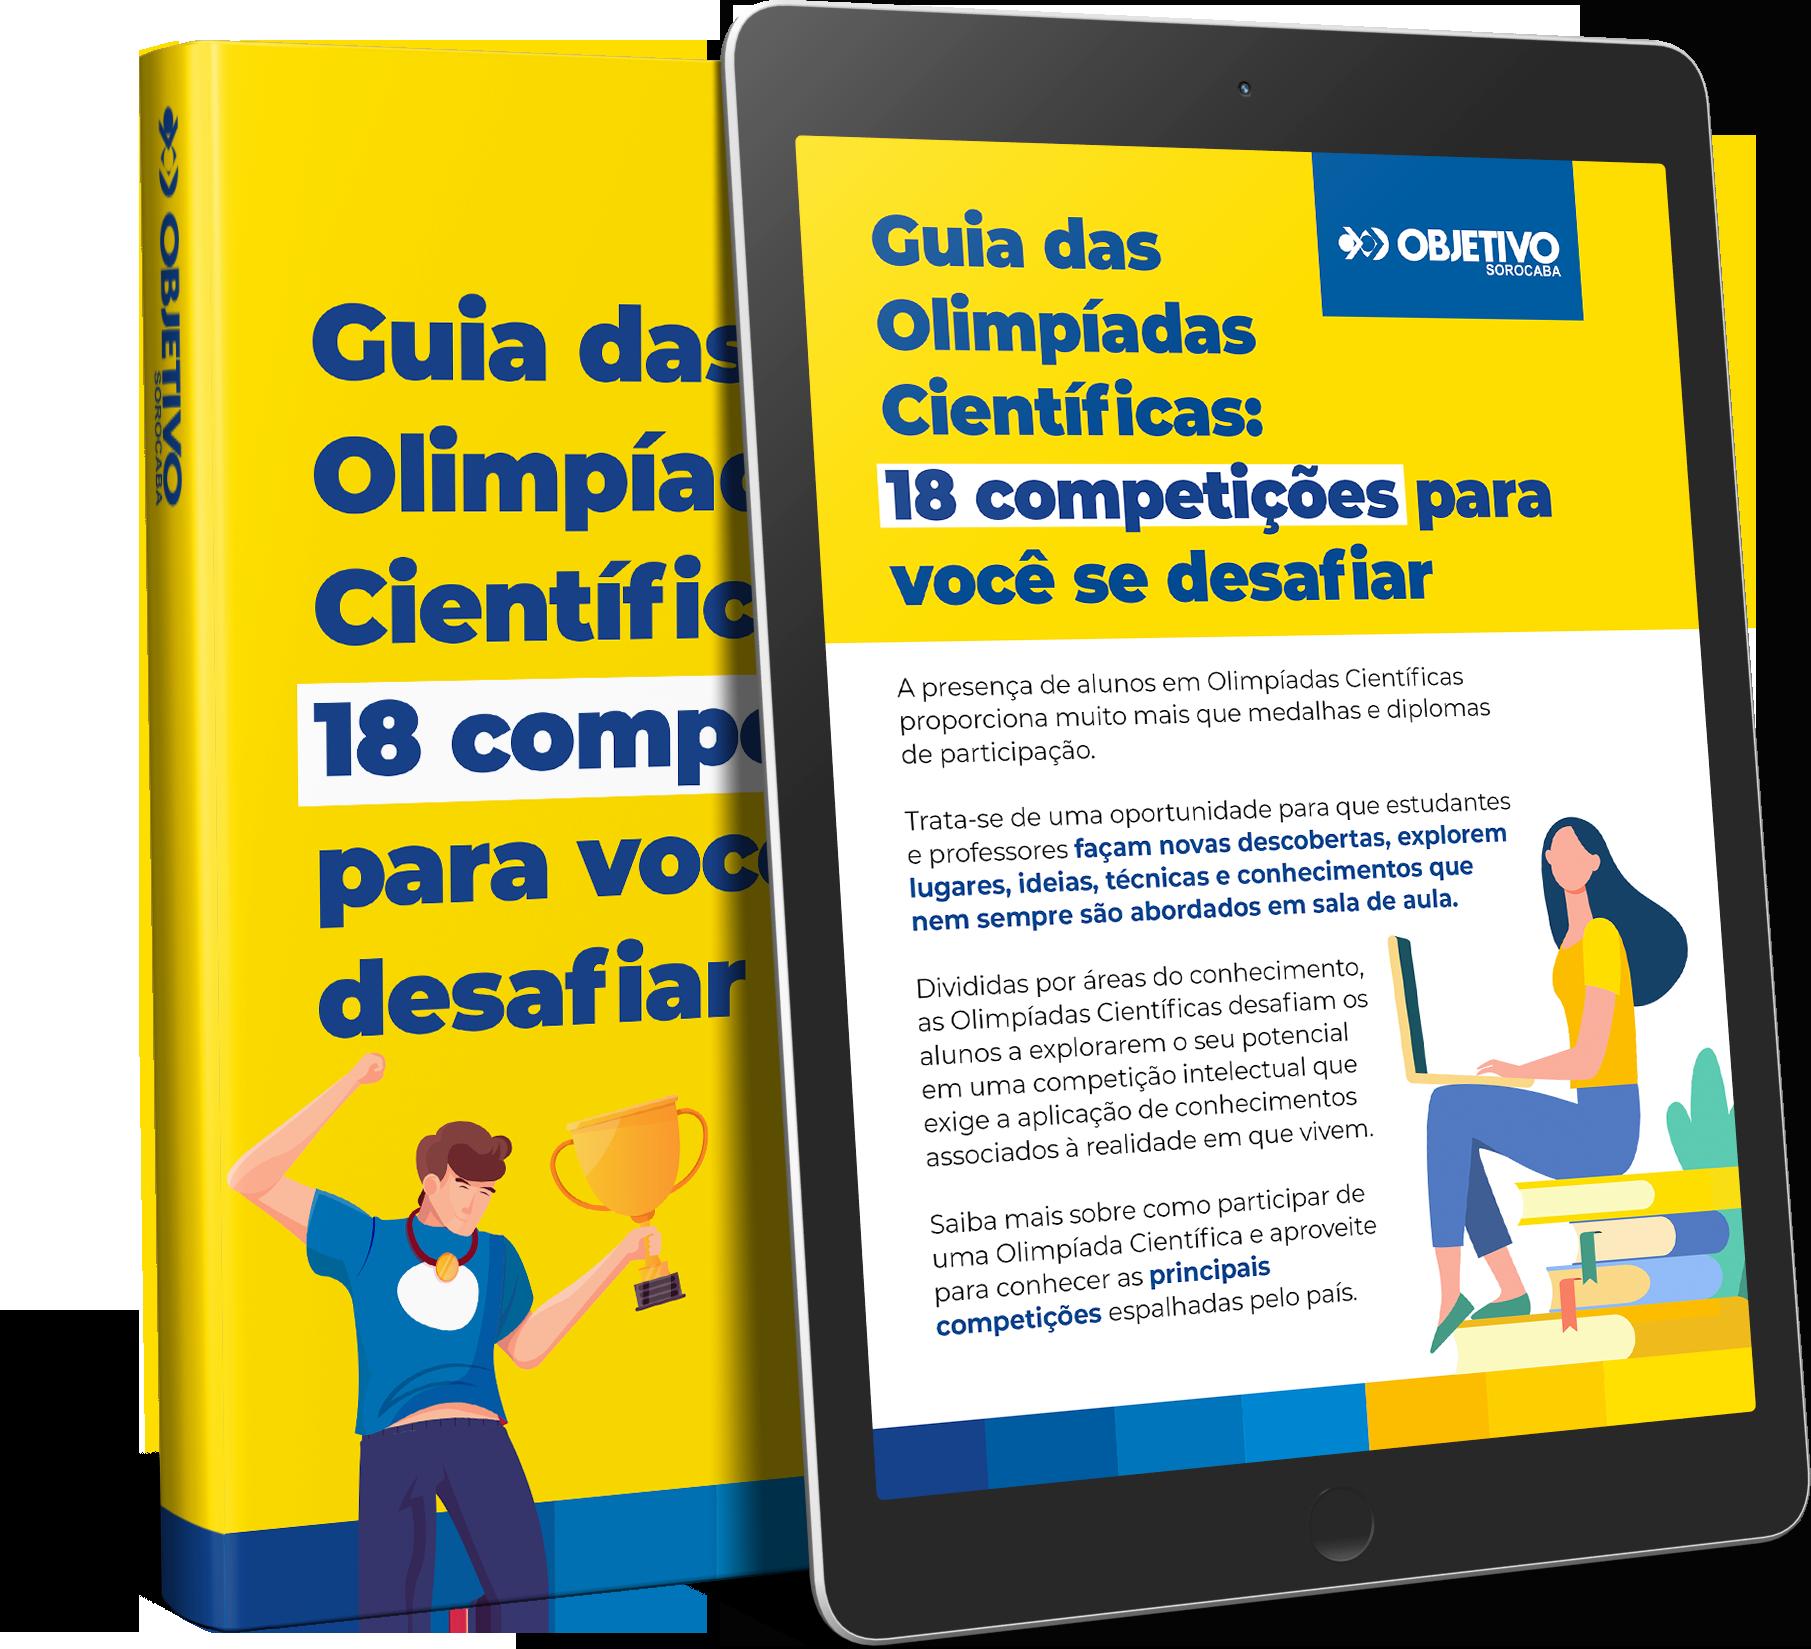 Guia Olimpíadas Científicas